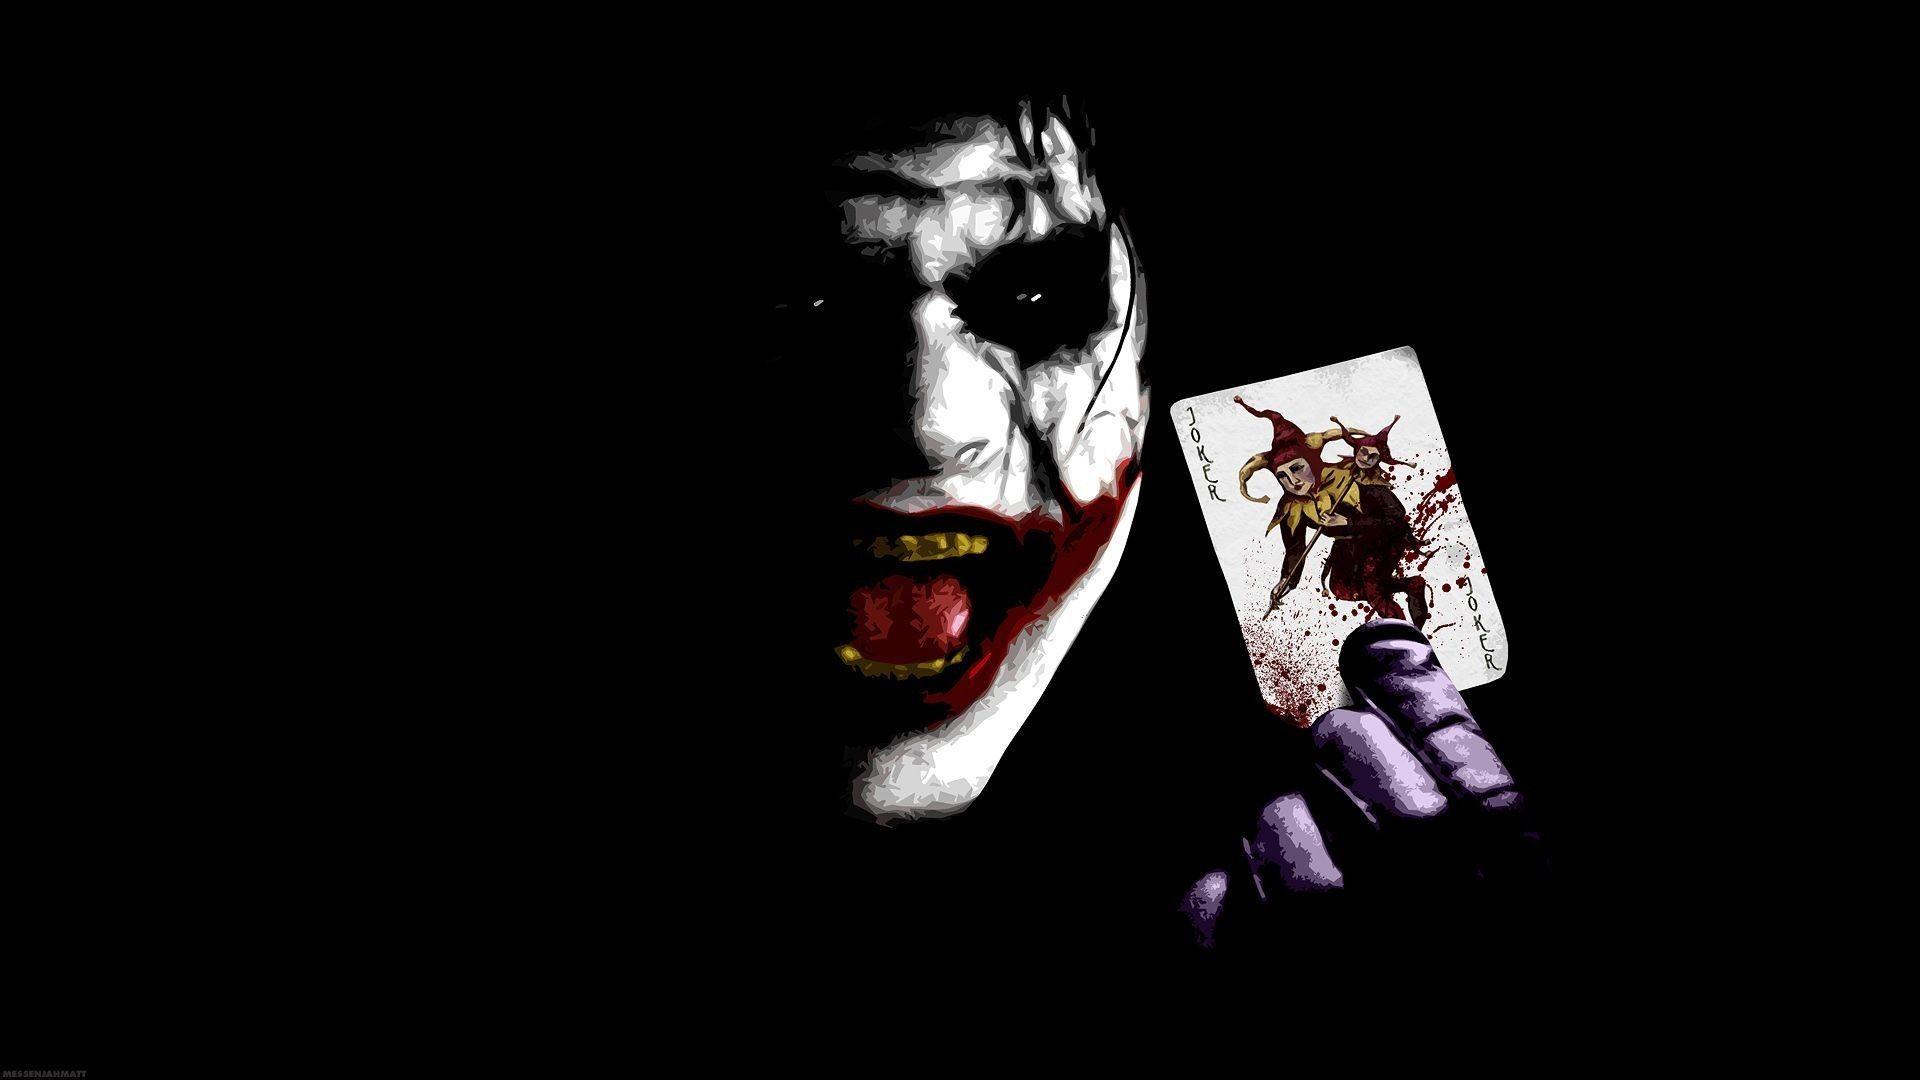 1920x1080 Joker Wallpaper In Dangerous Mod With Joker Card On Joker Wallpaper Joker Wallpapers Wallpaper Joker